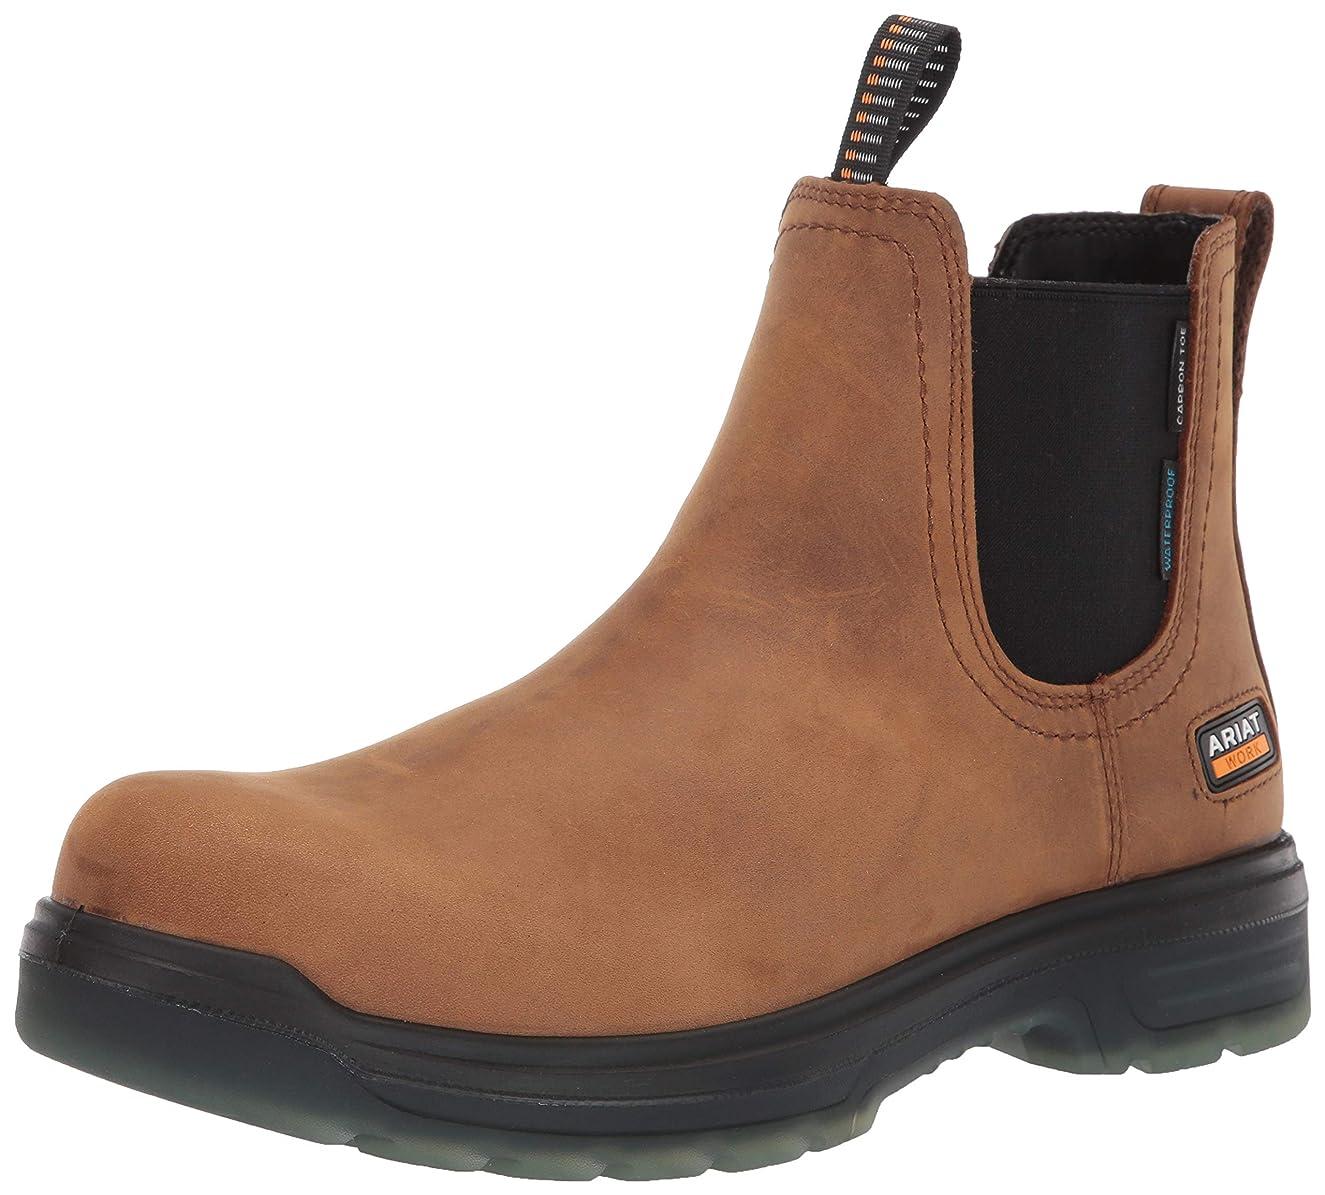 197b54b87aa Columbia Men's Dorado Litup 10 PFG Rain Boot rxyup700864 ...